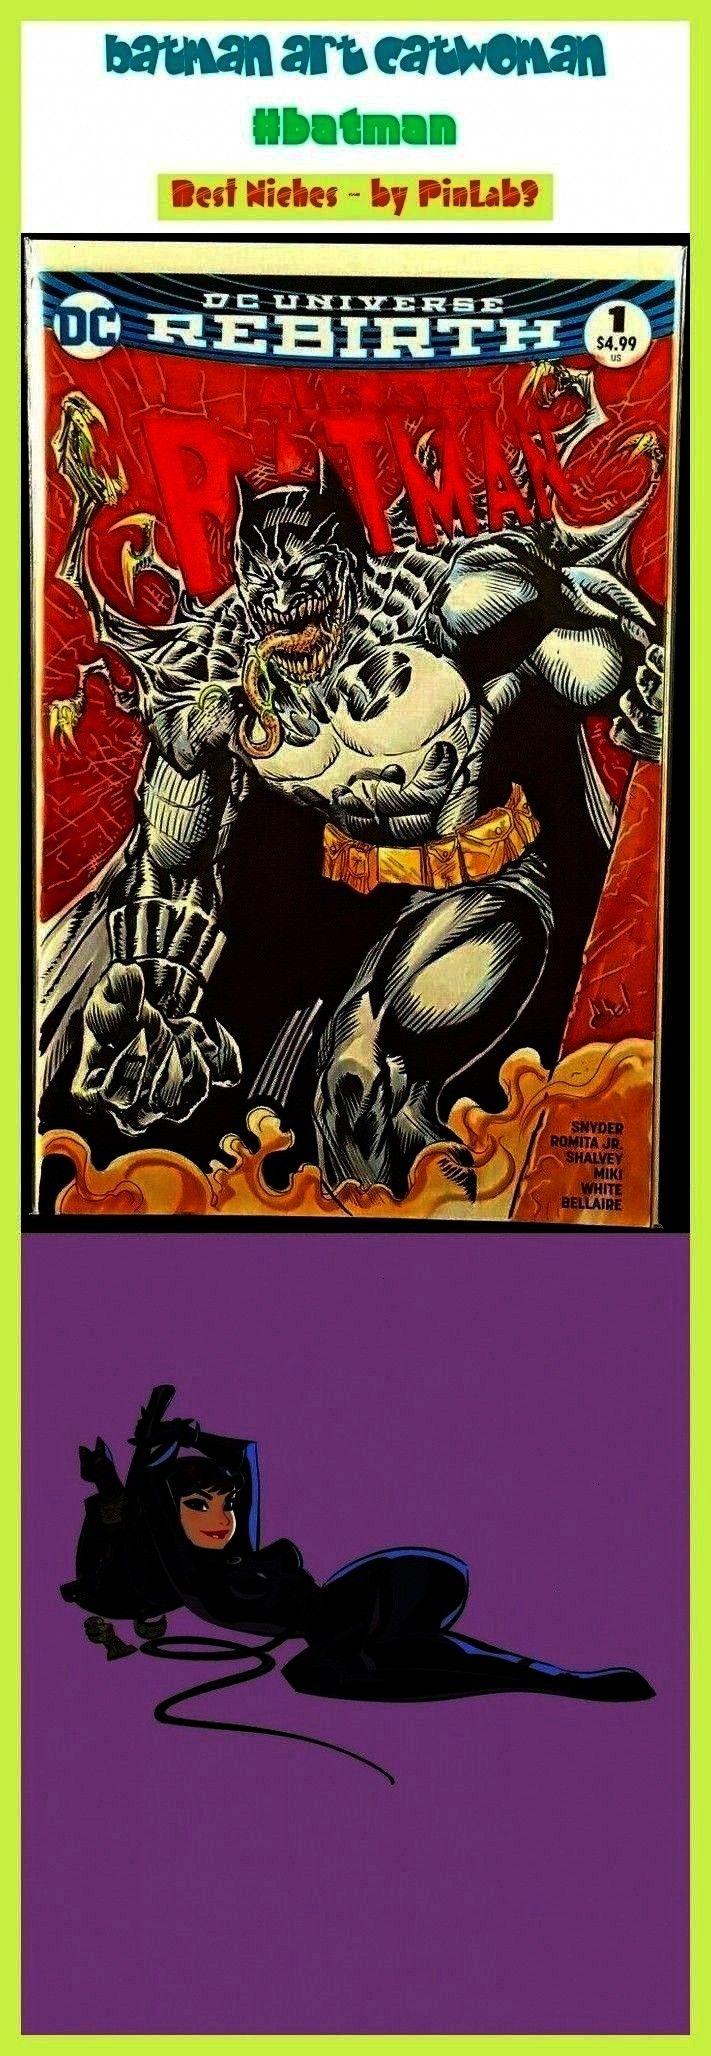 Art Catwoman  batman art catwoman  Batman arte catwoman  batman art drawing badass batman art batman art painting batman art deviantart batman art dark batman art diy bat...